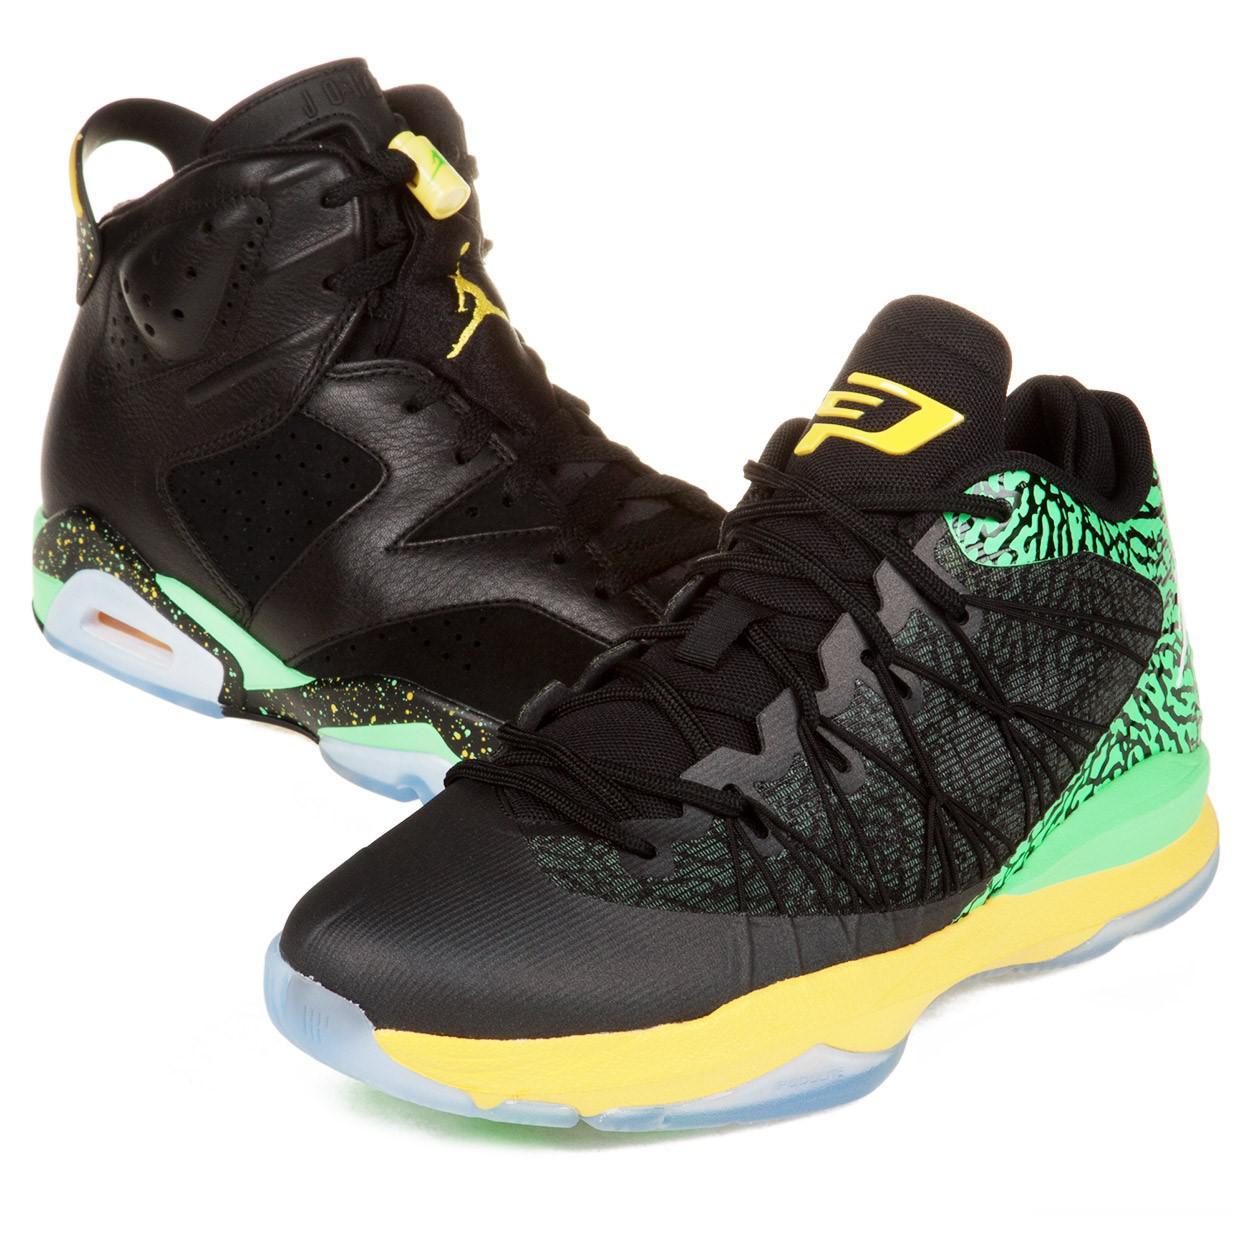 685ebcc9260 Lyst - Nike Mens Jordan Brazil Pack Black/green/yellow 688447-920 ...